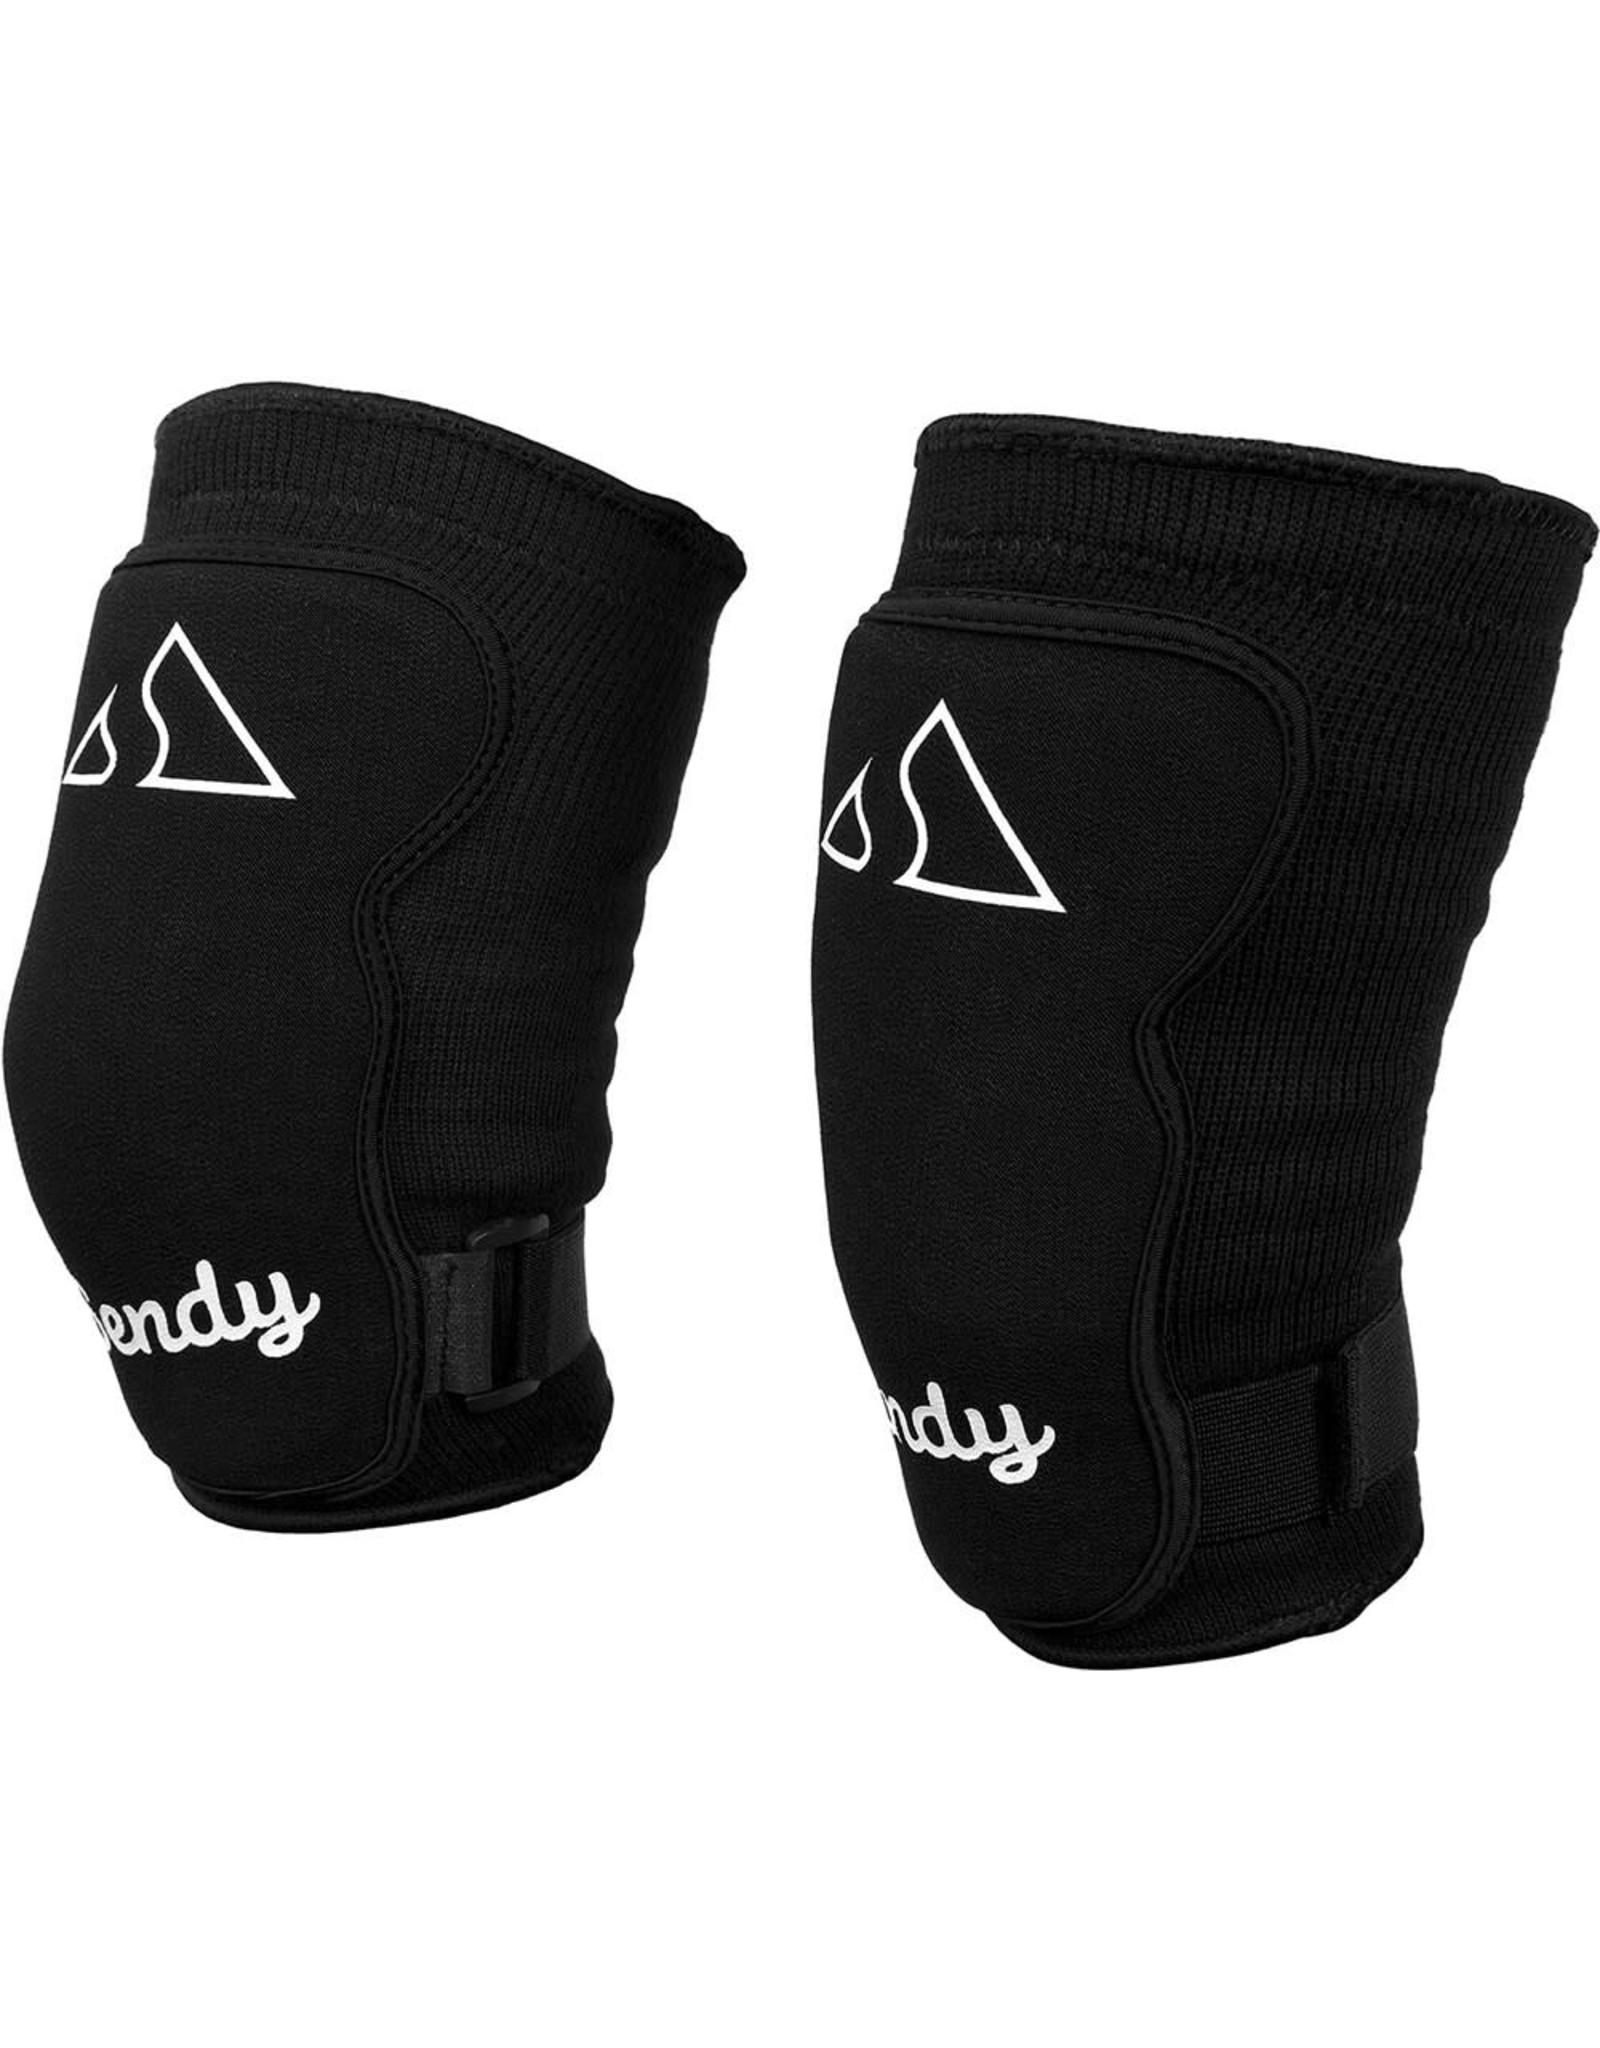 Sendy Saver Knee Pad Youth